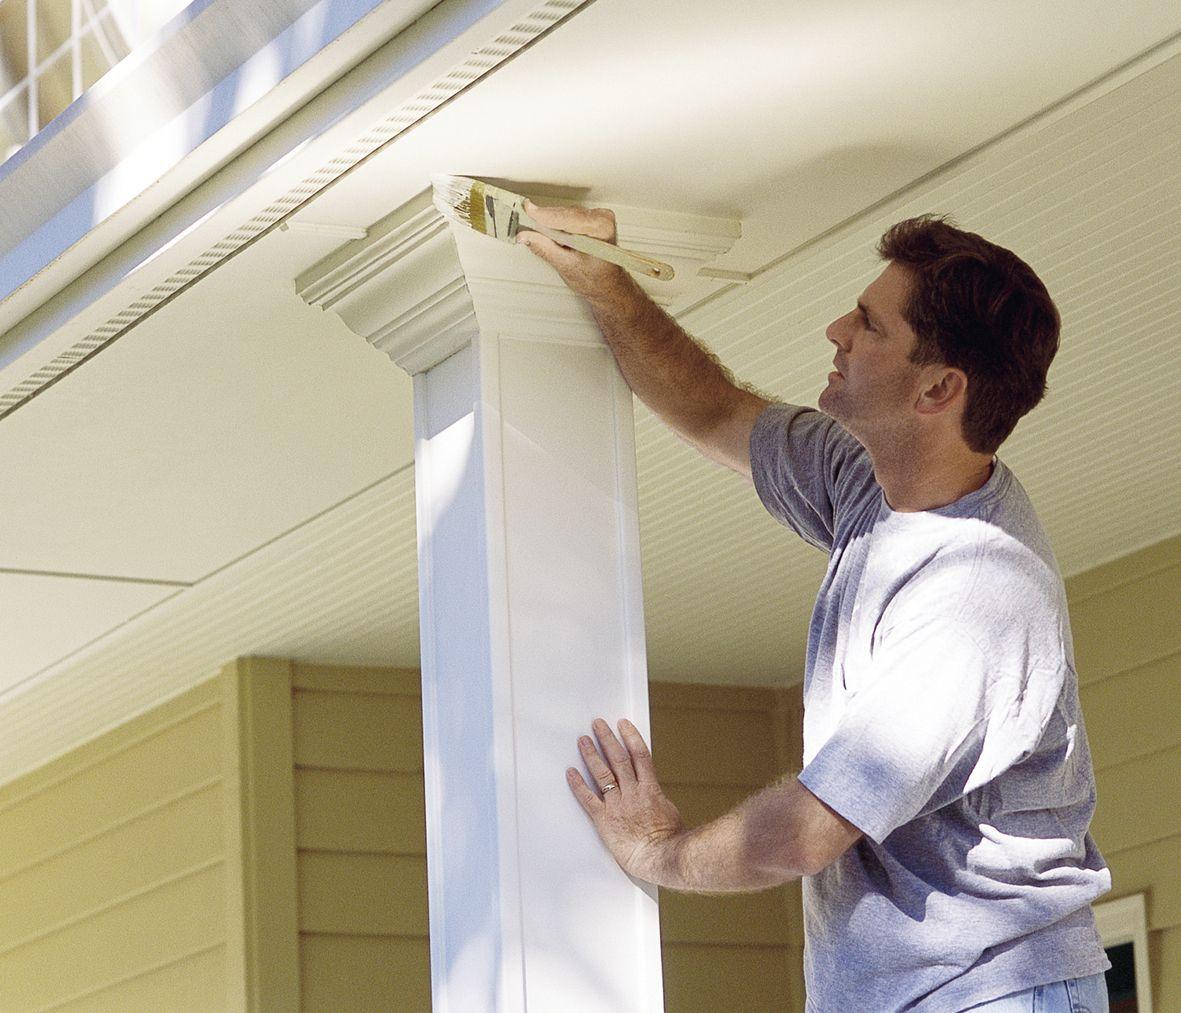 man painting house house painters pinterest house painter